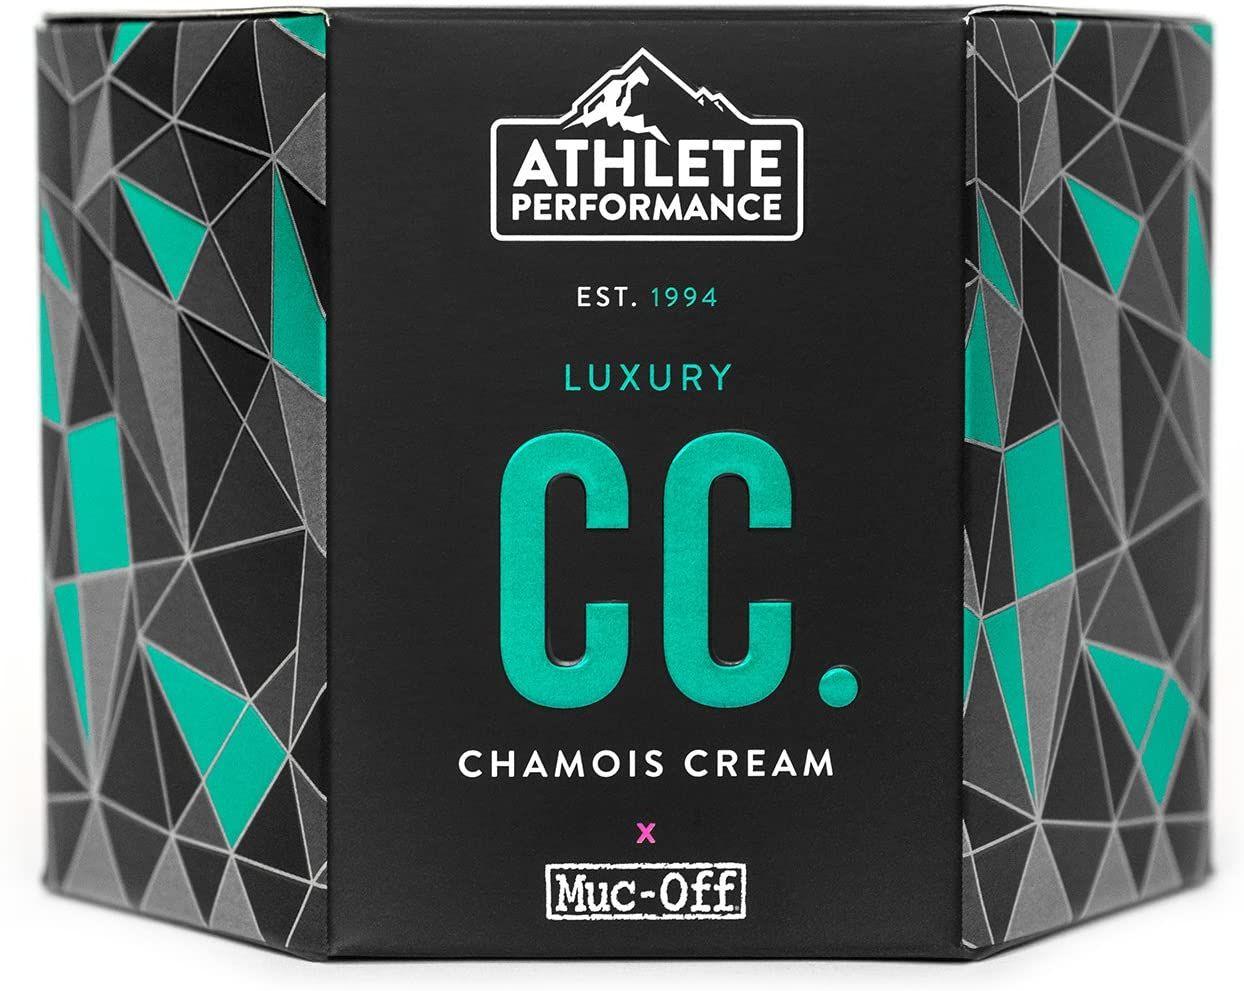 Muc-Off Athlete Performance Luxury Chamois Cream 250ml £9.69 for Prime at Amazon